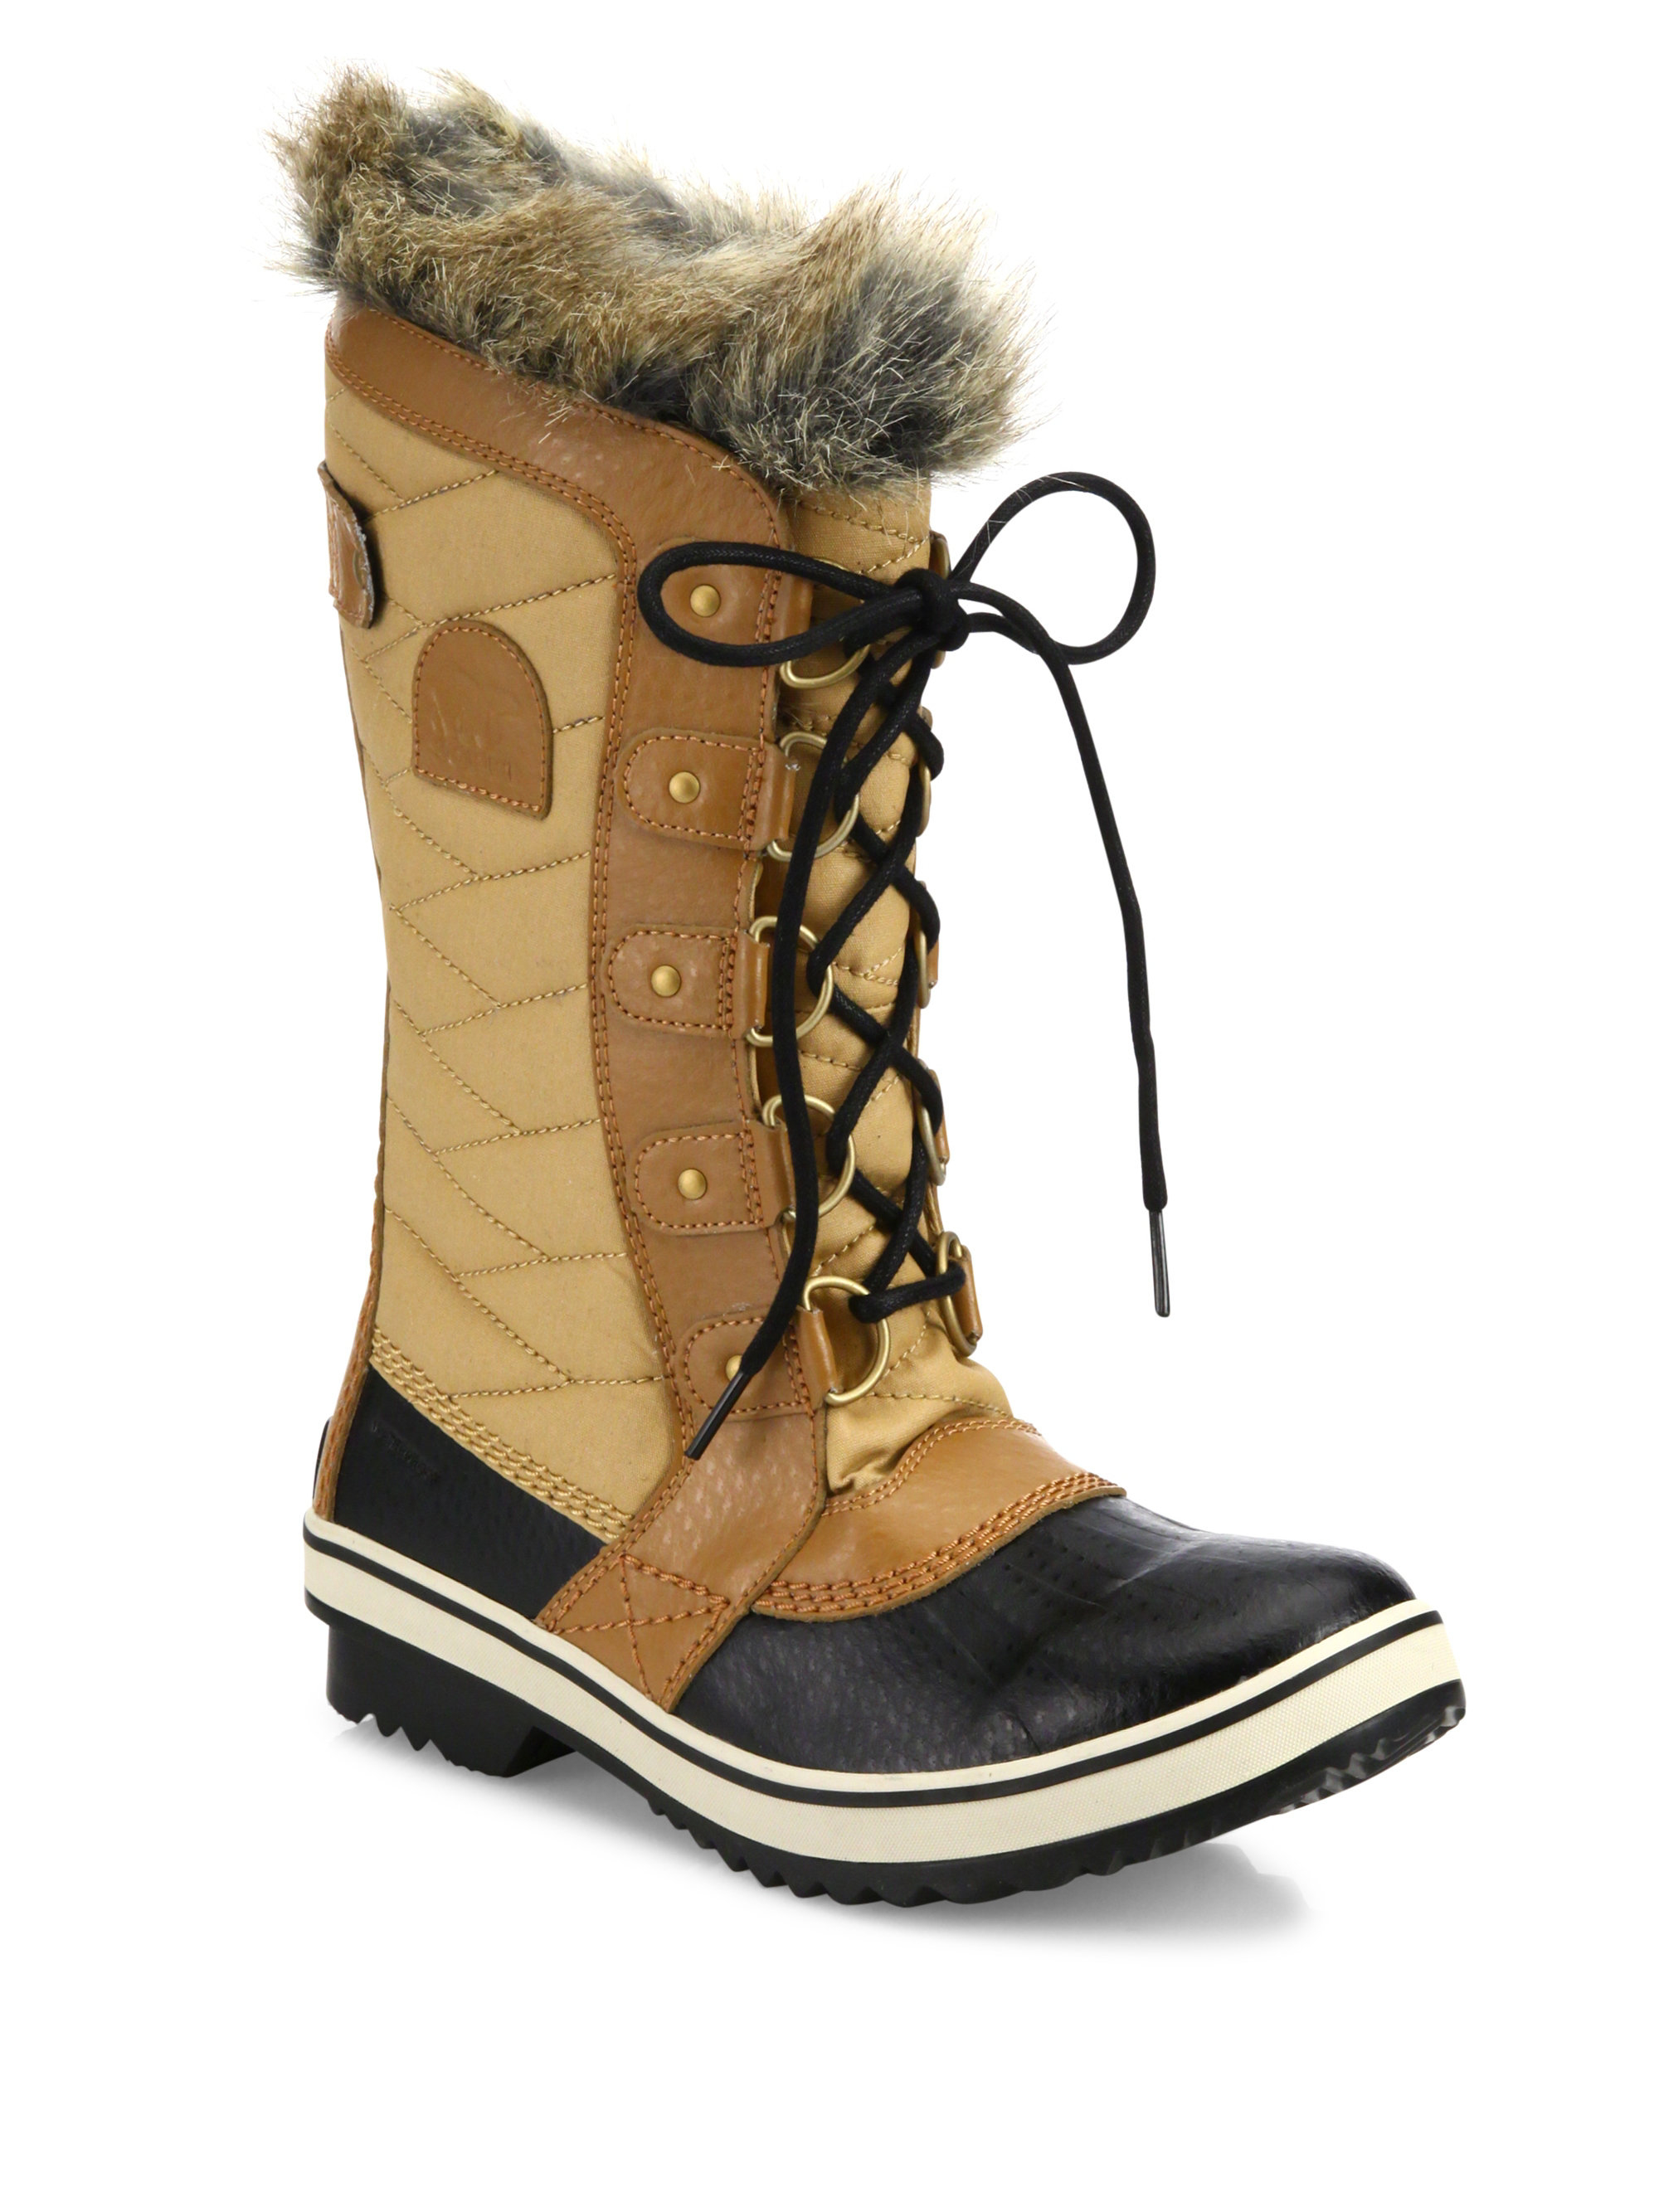 Sorel Tofino Ii Coated Canvas Amp Faux Fur Winter Boots Lyst